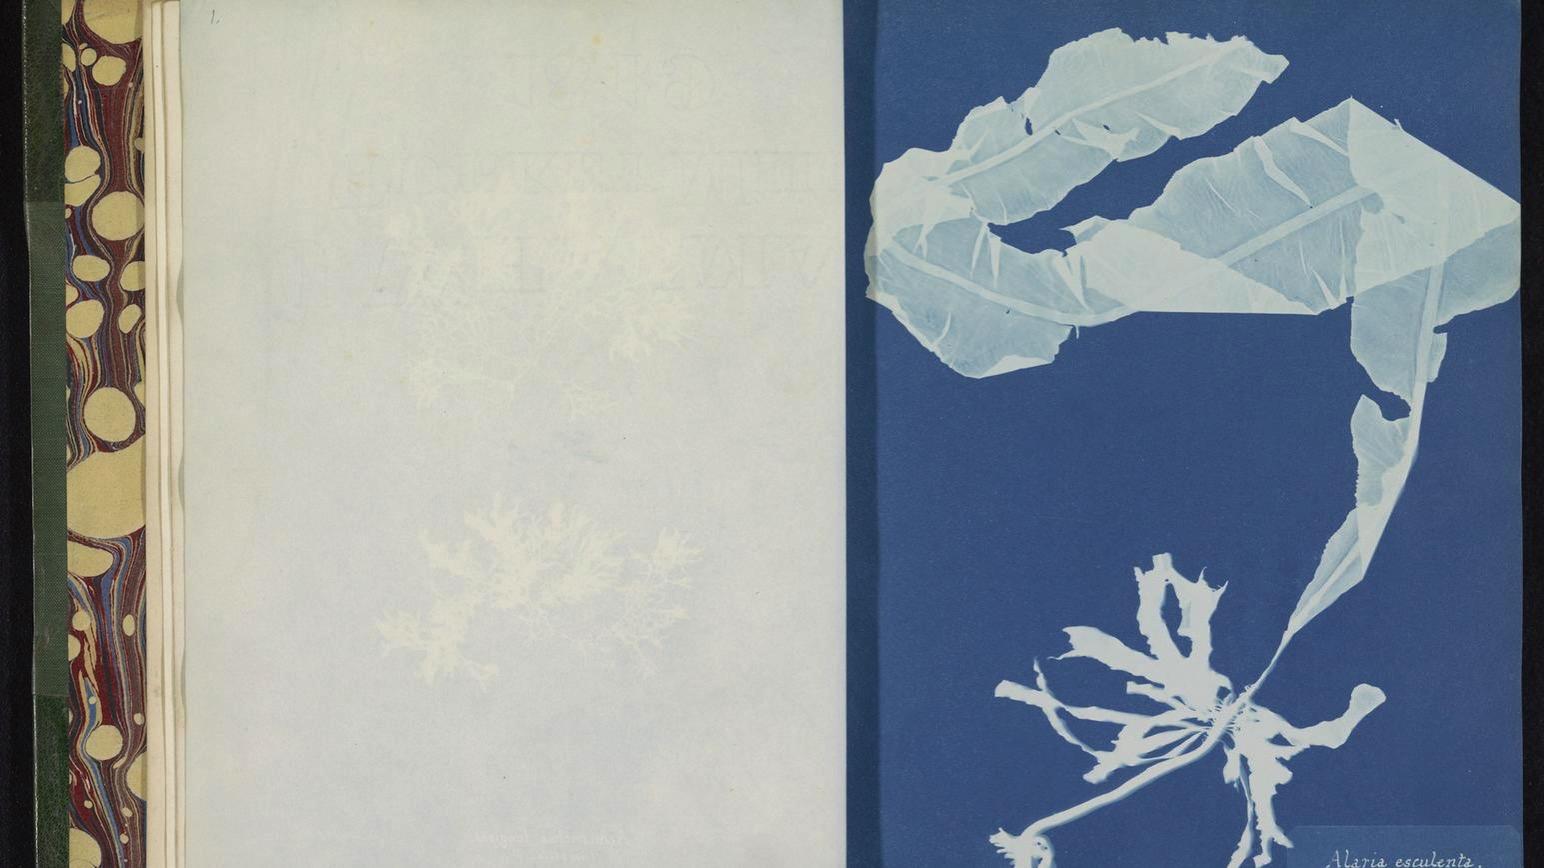 1495552449890 Anna Atkins Photographs of British Algae Cyanotype Impressions 1843 1853 RP F 2016 133 00 1 p1bgqtngfh6km174gqmcrafjsa